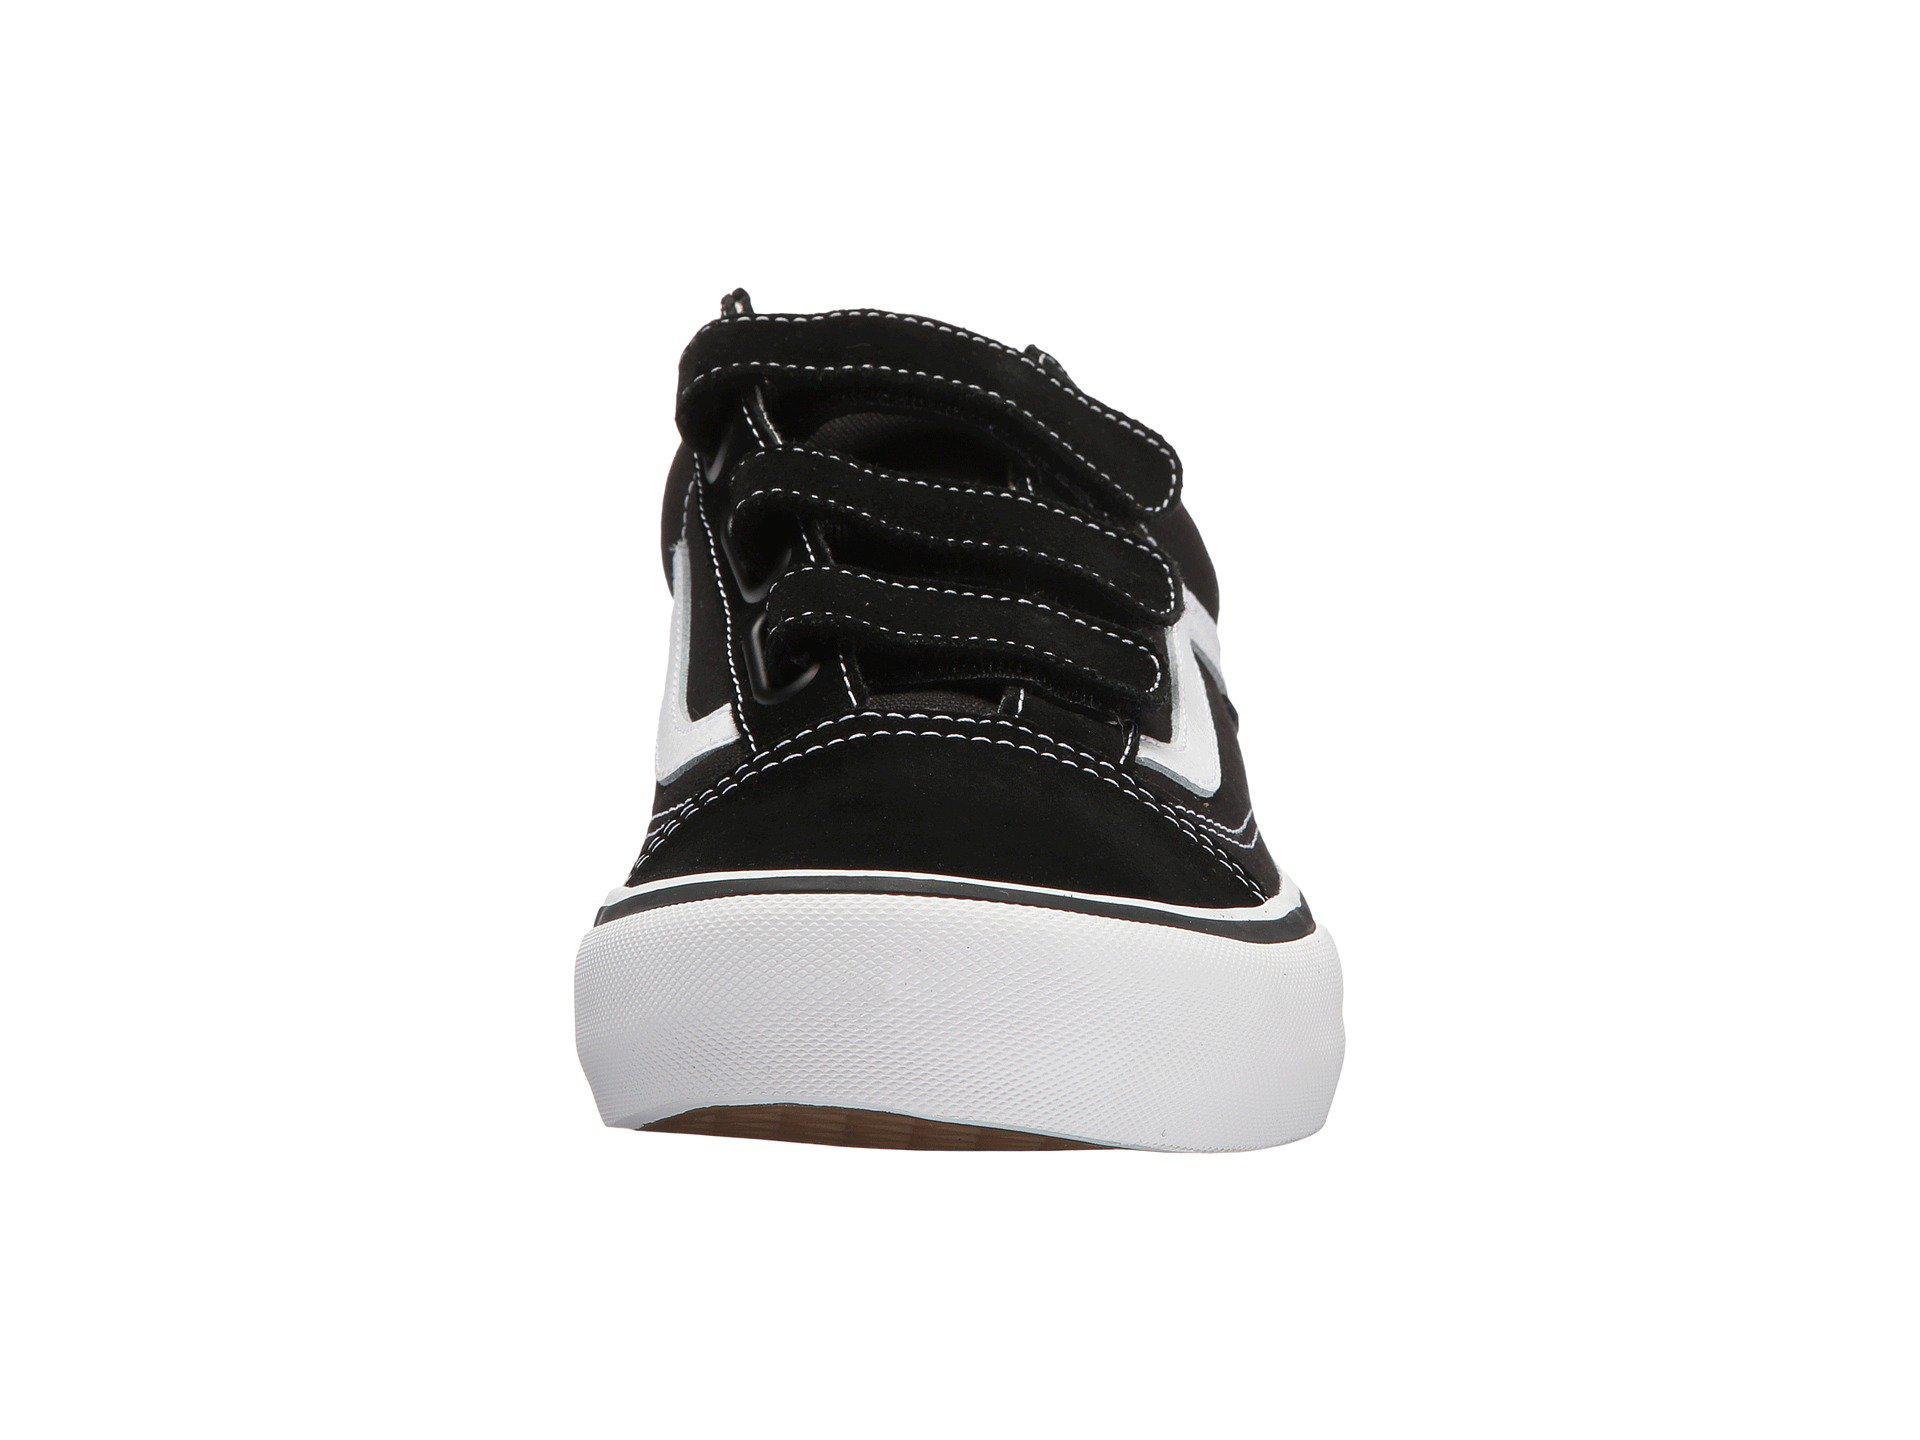 f42f6efe2c9d52 Lyst - Vans Old Skool V Pro (black white) Men s Skate Shoes in Black ...